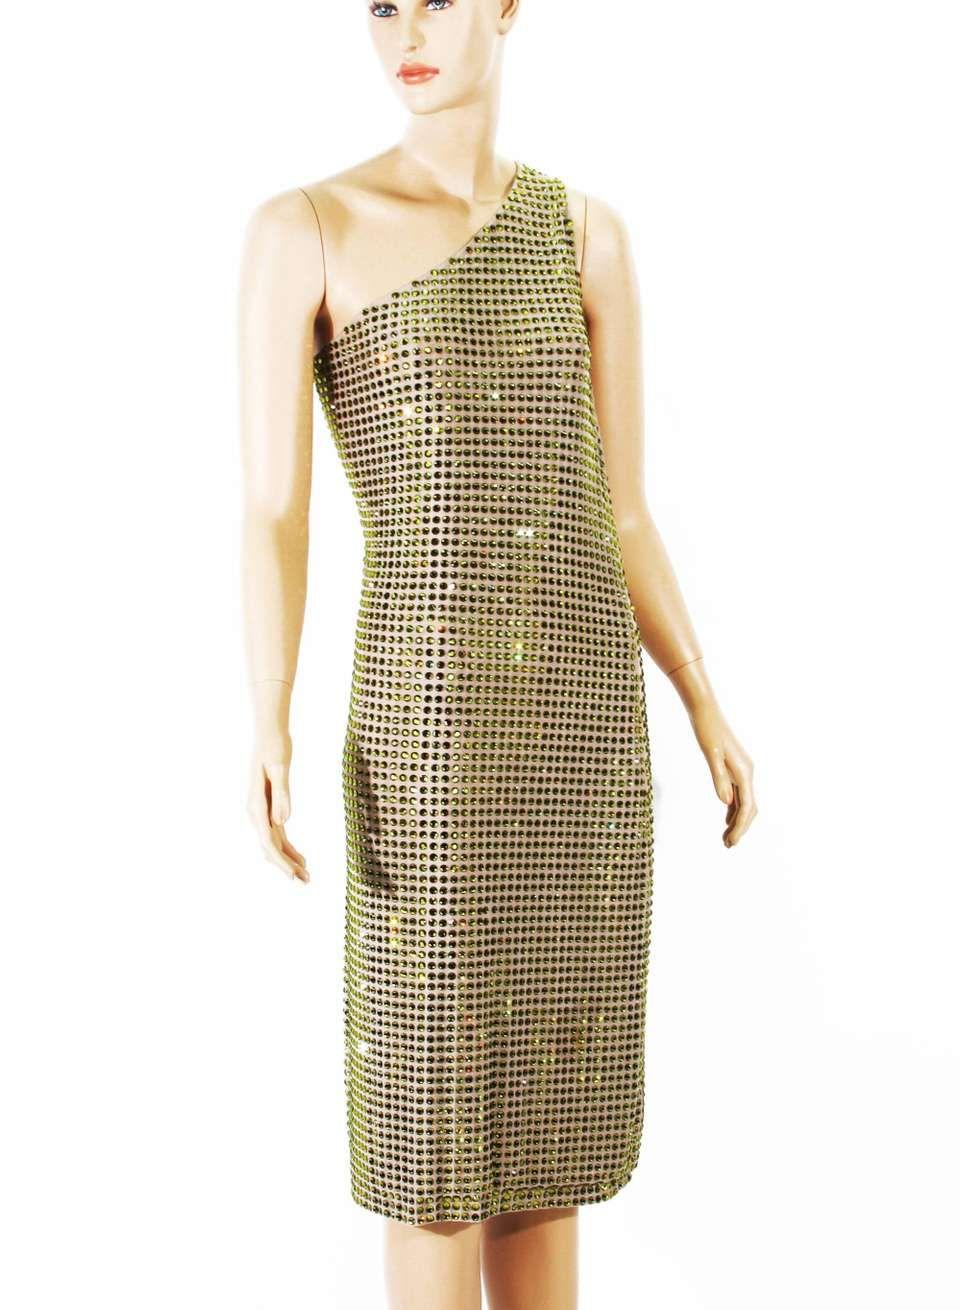 4196478a0ba For Sale on 1stdibs - Tom Ford for Gucci Documented Fully Crystal  Embellished One Shoulder Dress Spring/Summer 2000 Collection Designer size  42 Green ...